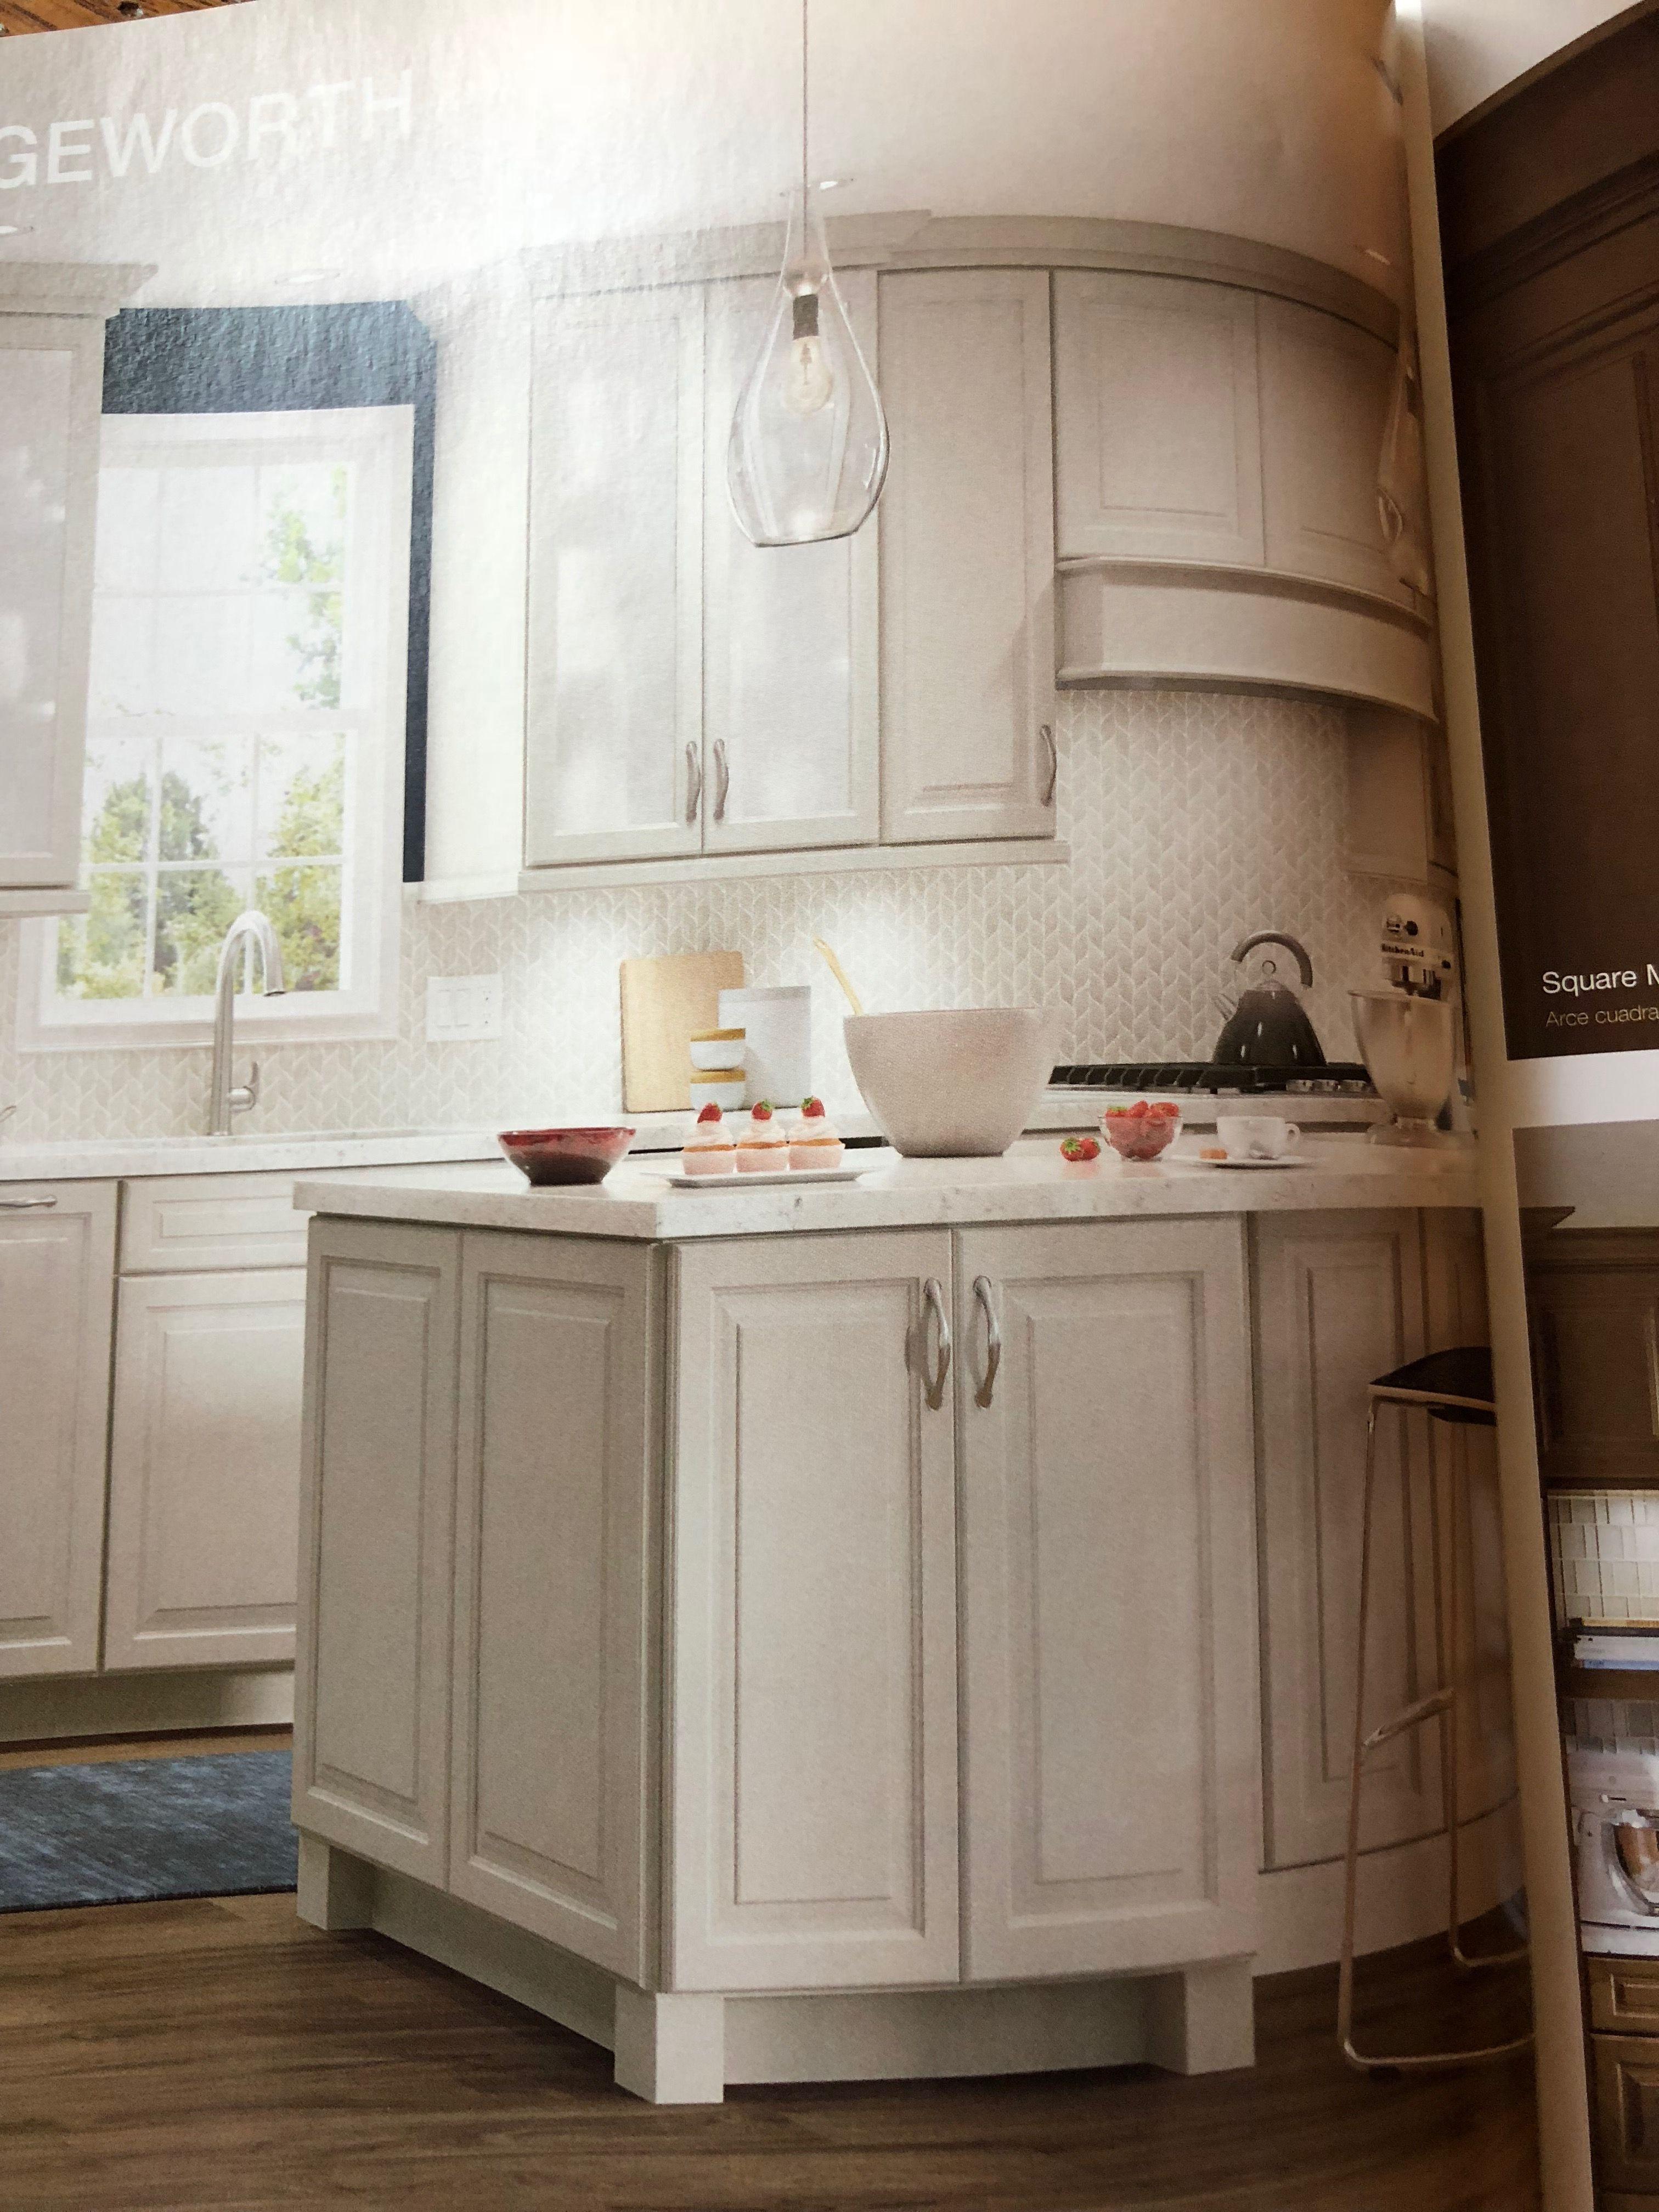 Pin by Jen Feldhausen on Kitchen ideas | Vanity, Bathroom ...